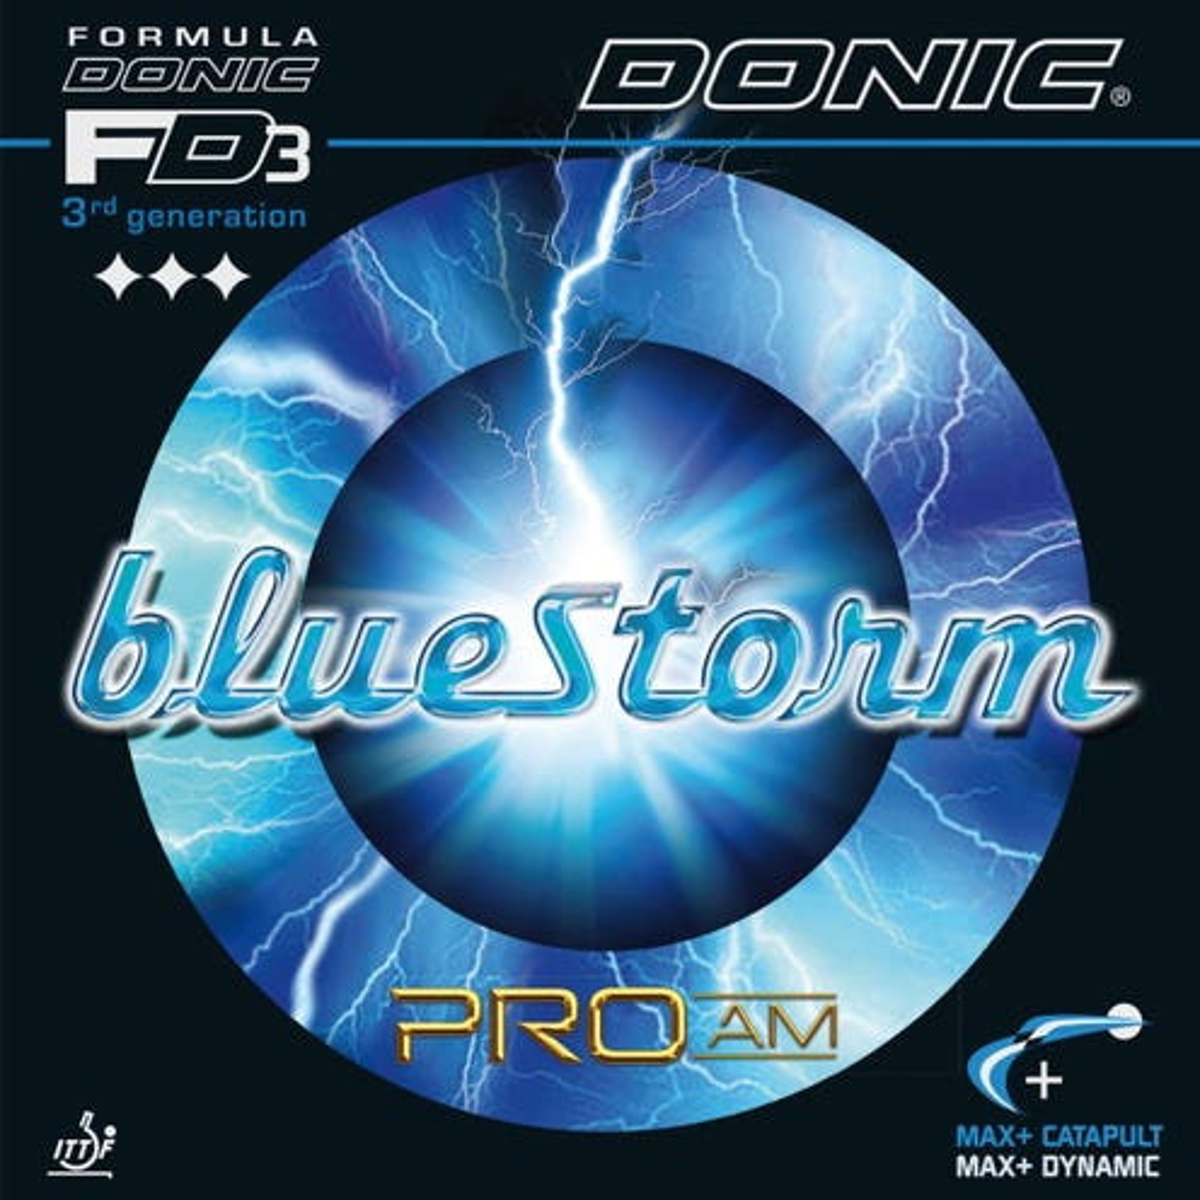 Donic Bluestorm Pro AM